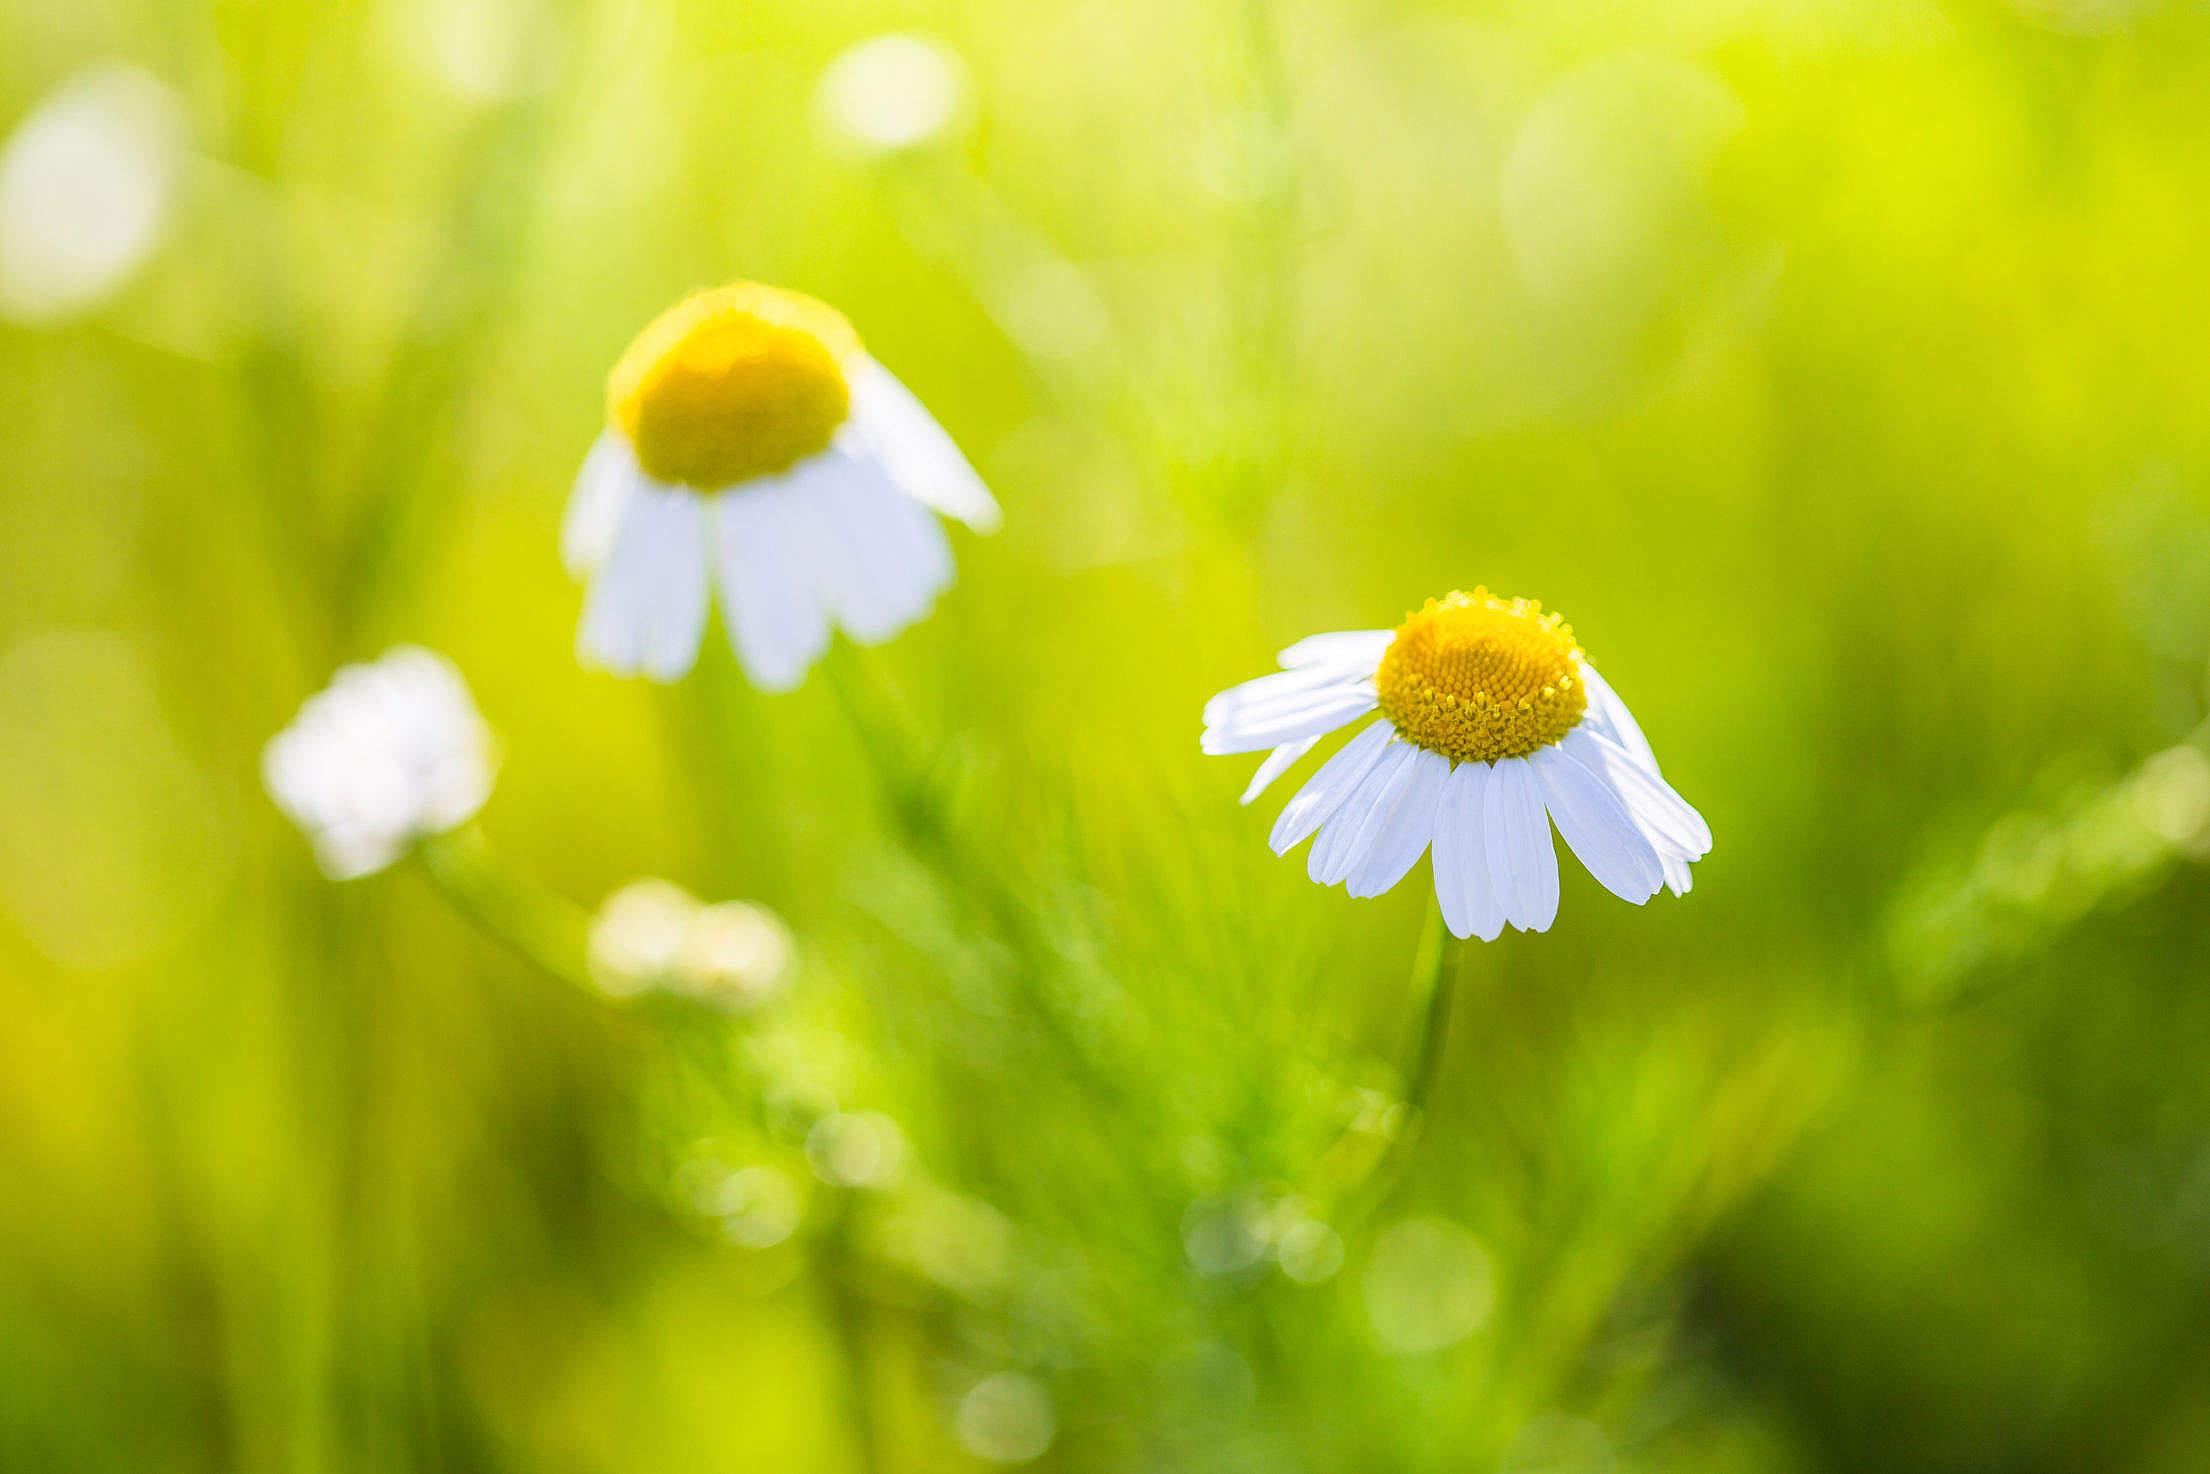 Wonderful Daisy with Bright Background Free Stock Photo